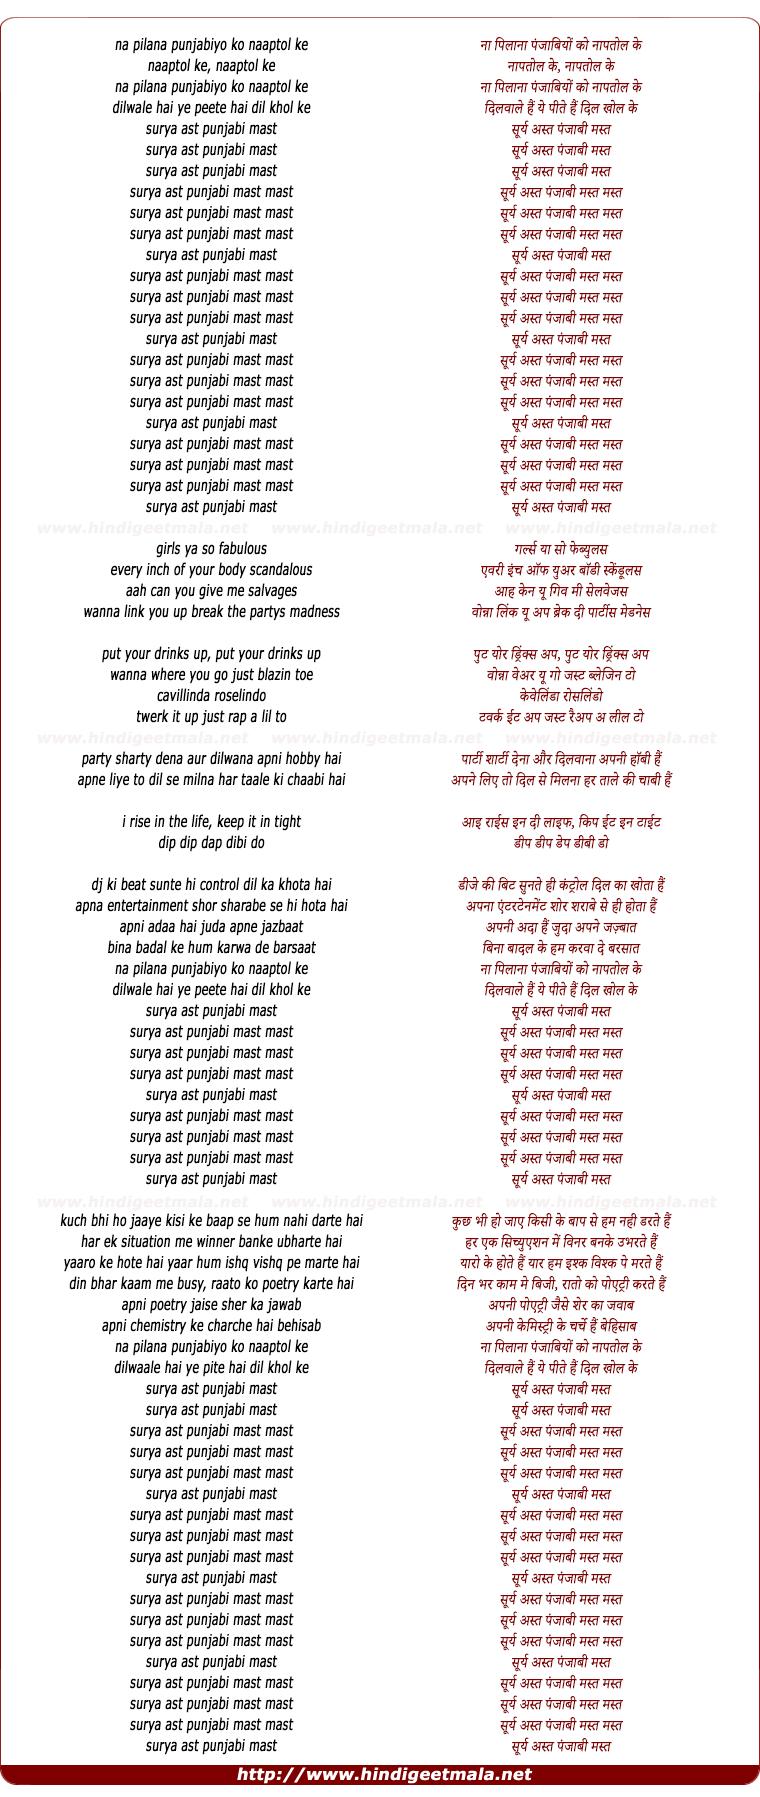 lyrics of song Punjabi Mast - Remix